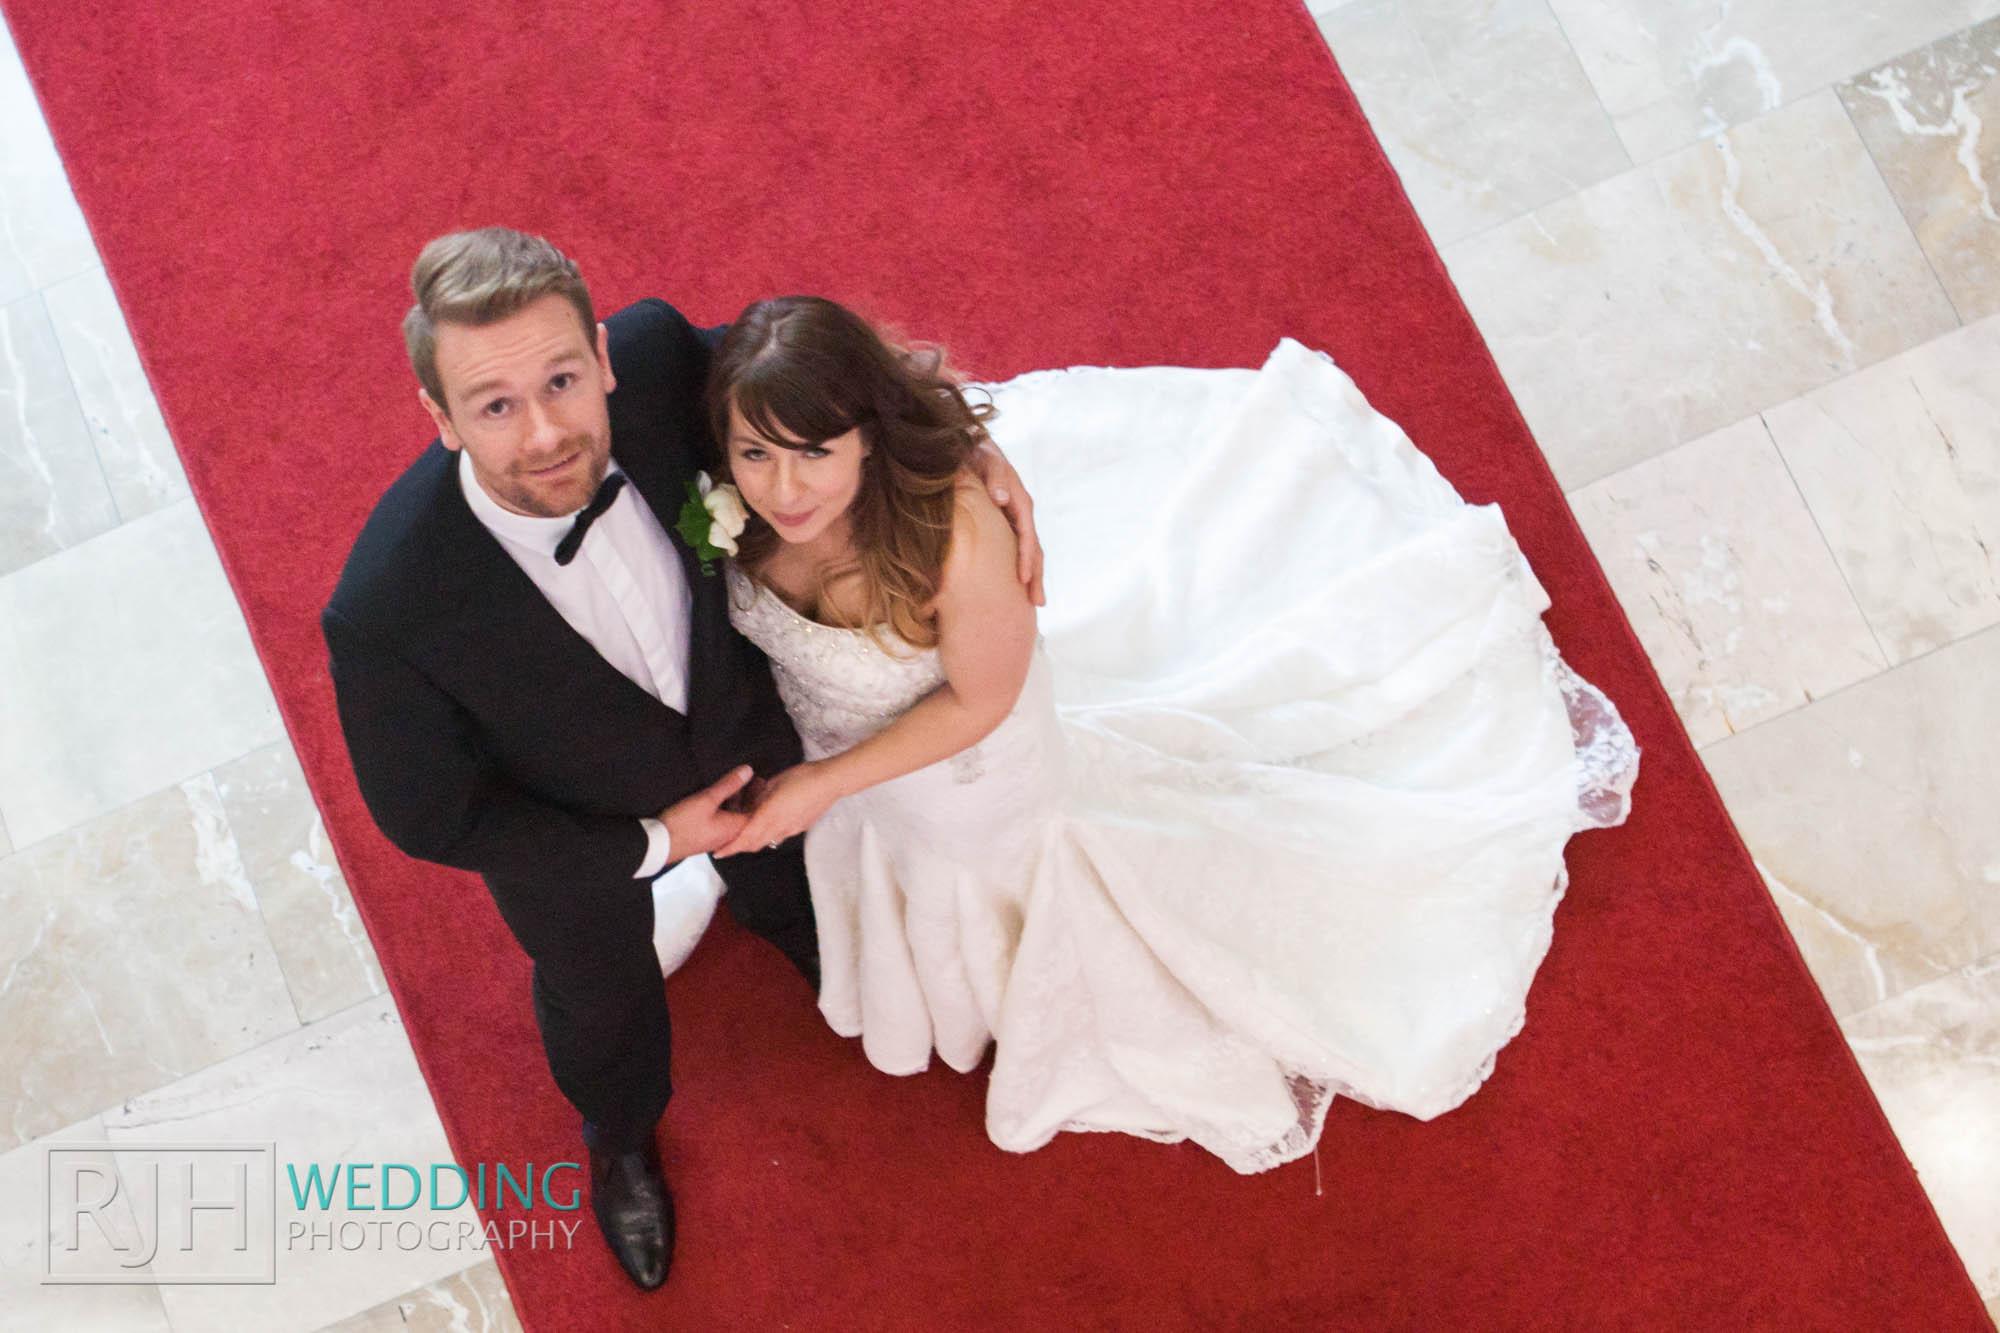 RJH Wedding Photography_2014 highlights_26.jpg